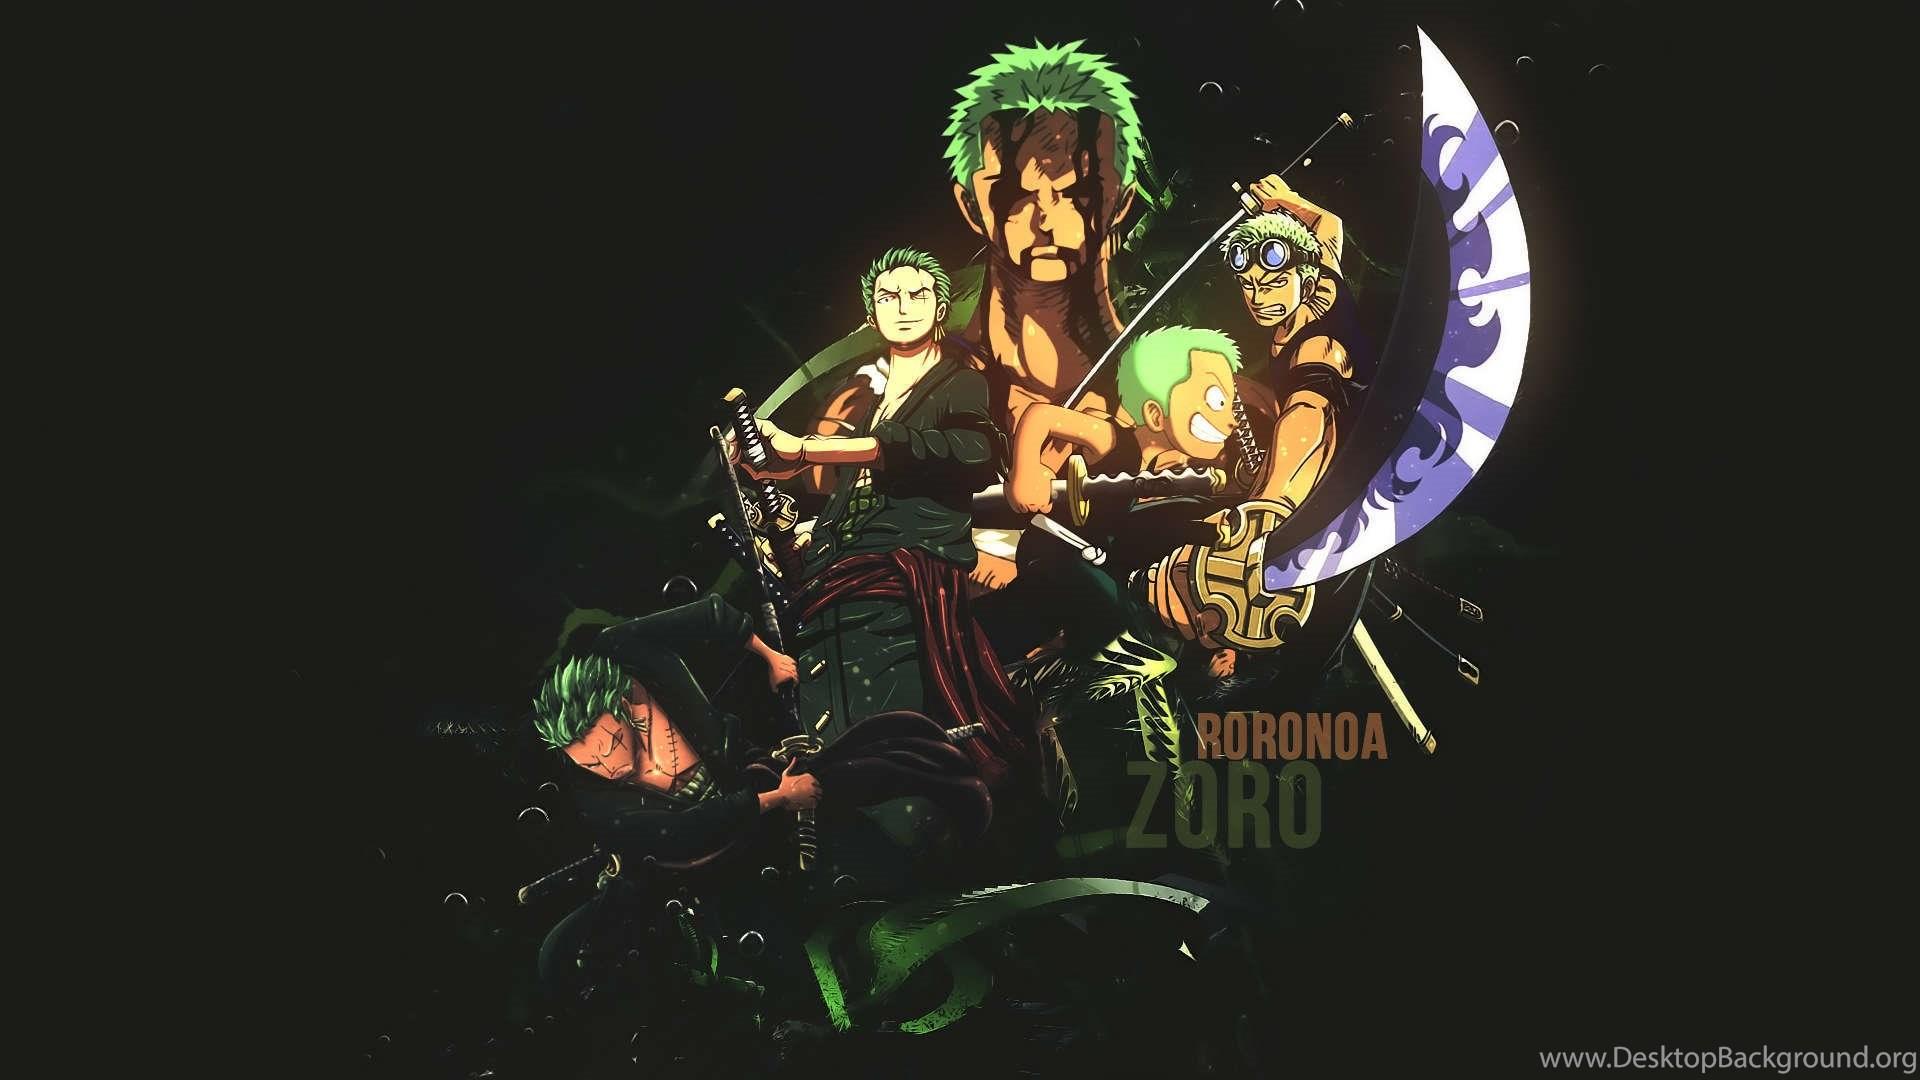 Zoro Wallpaper 4K Pc